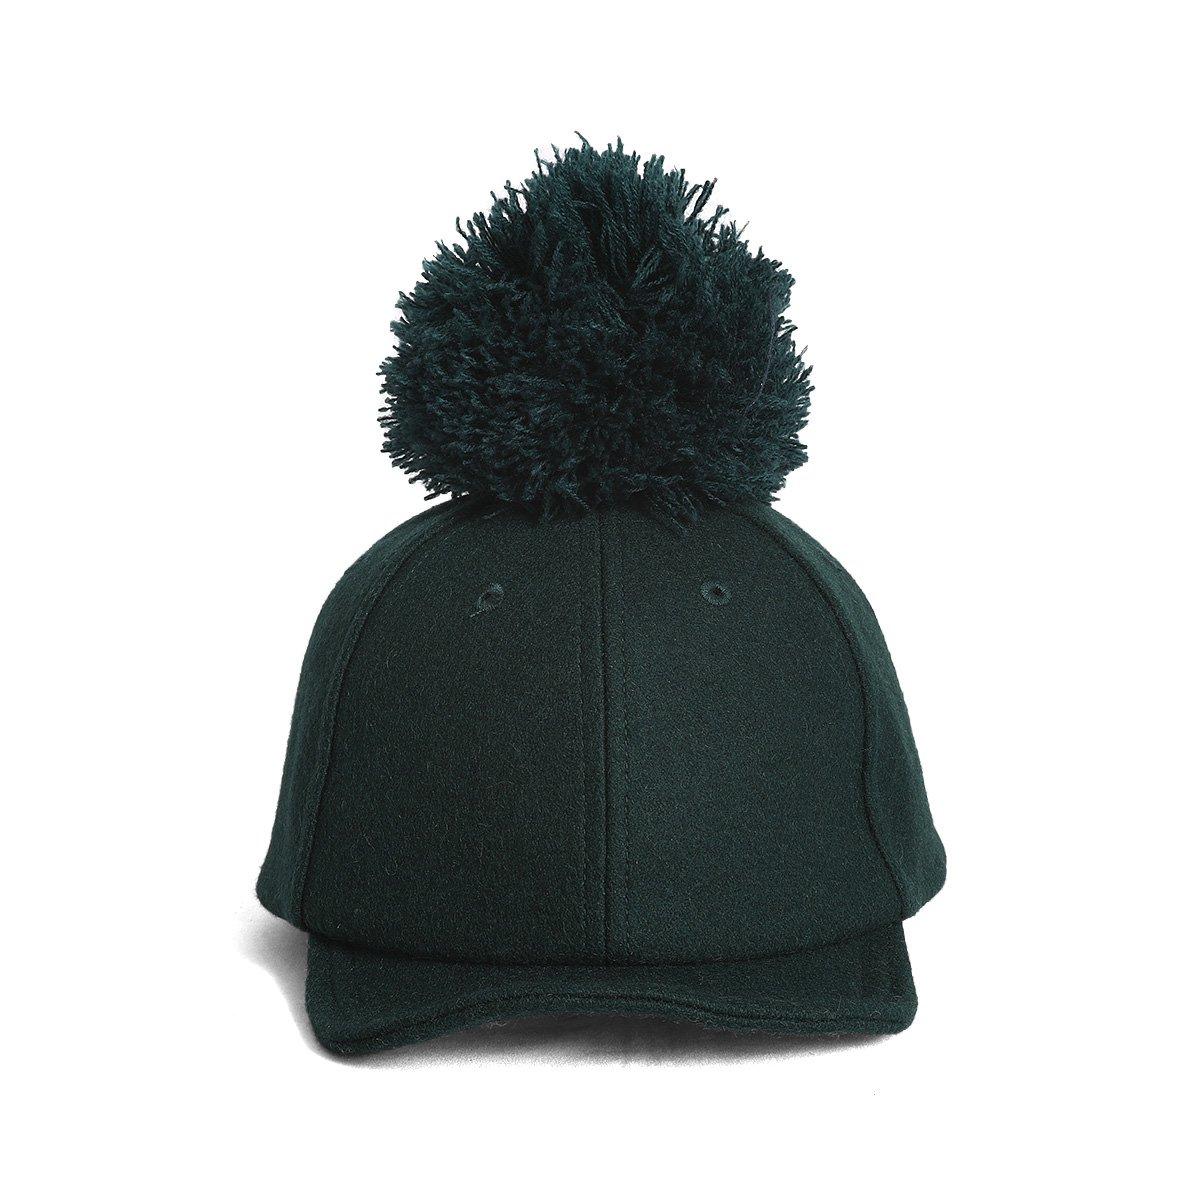 【KIDS】Wool Pom Cap 2 詳細画像4